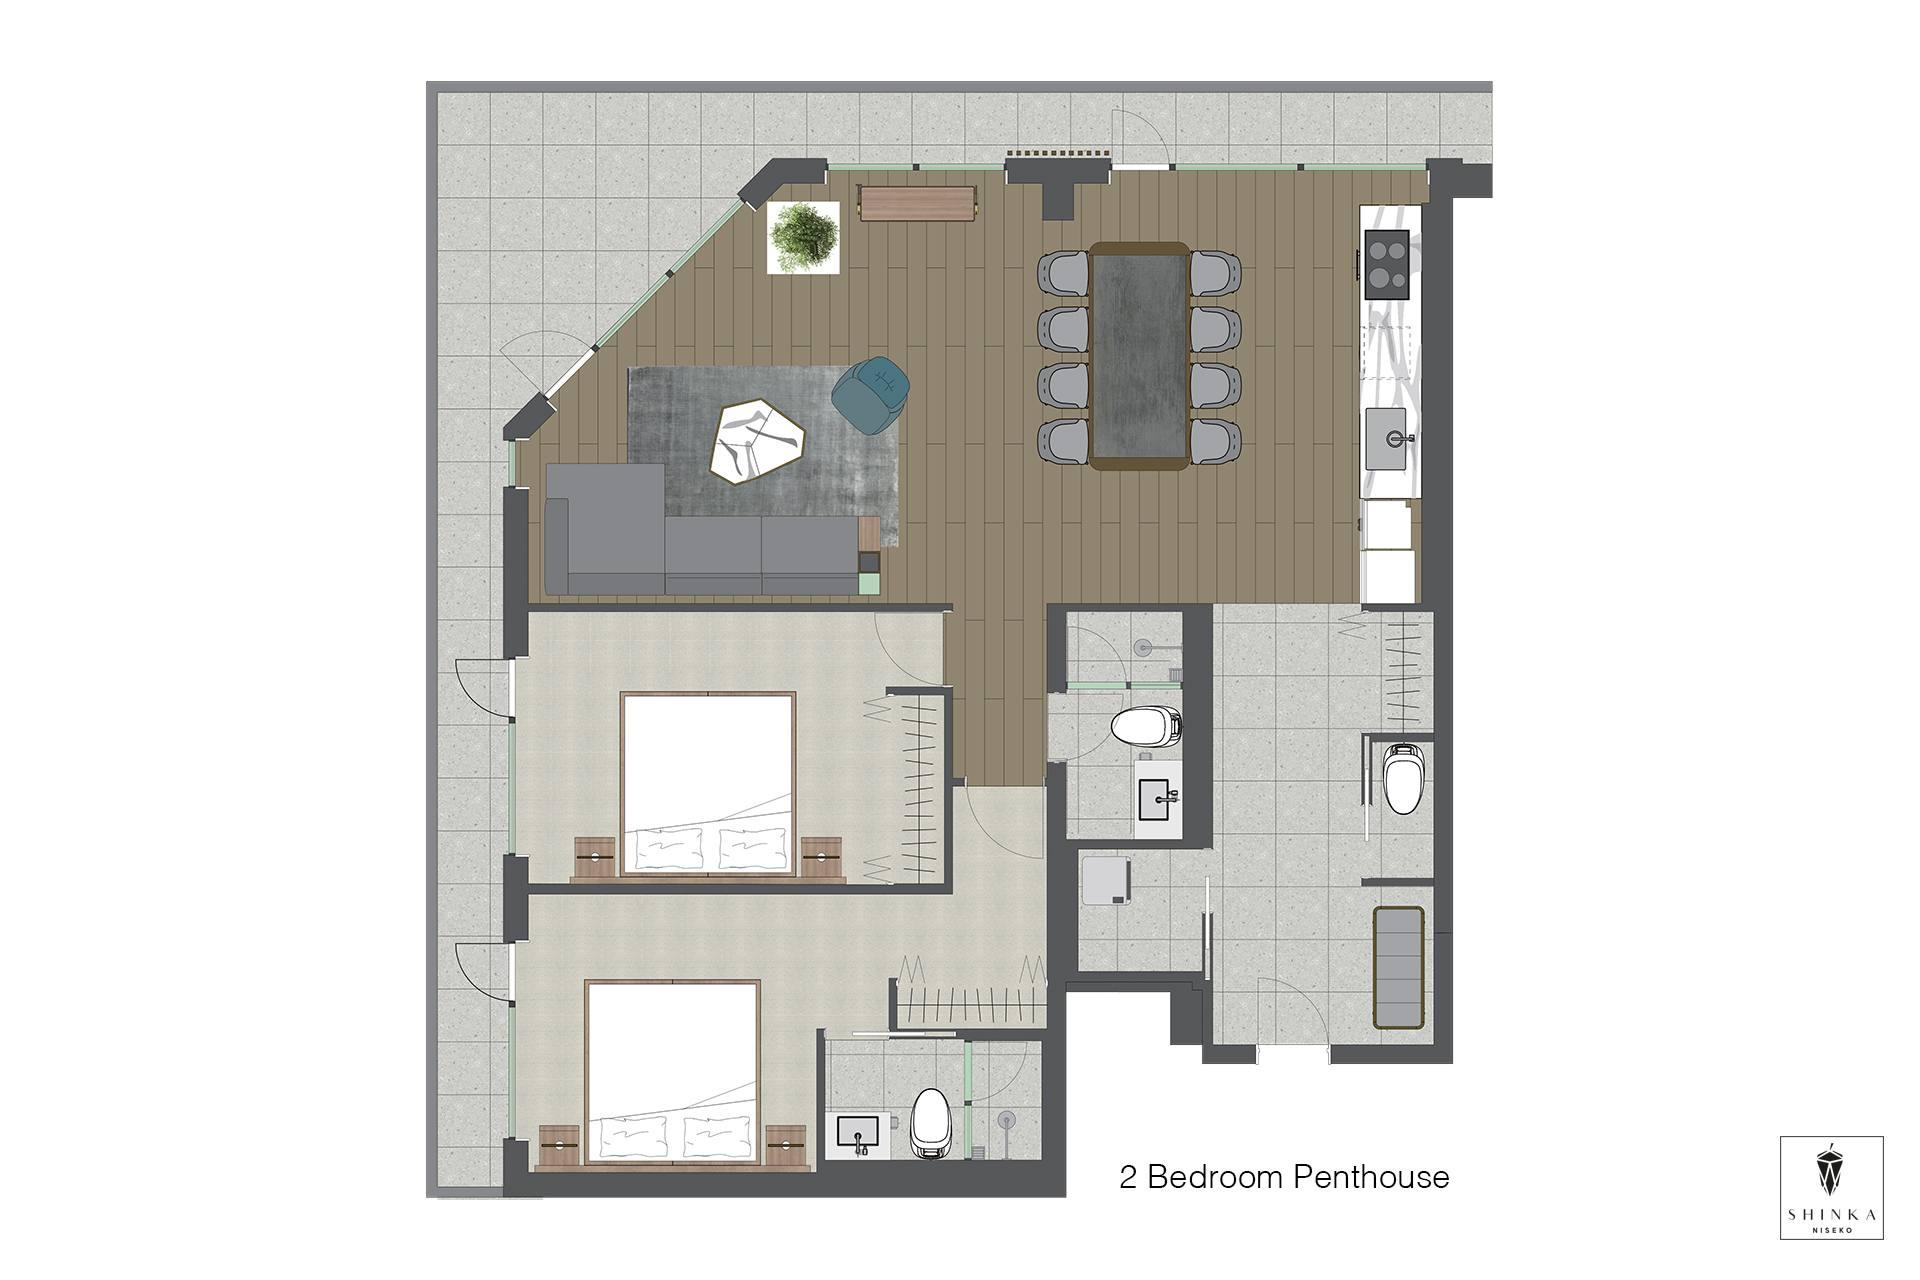 Shinka 2BR Penthouse Floorplan